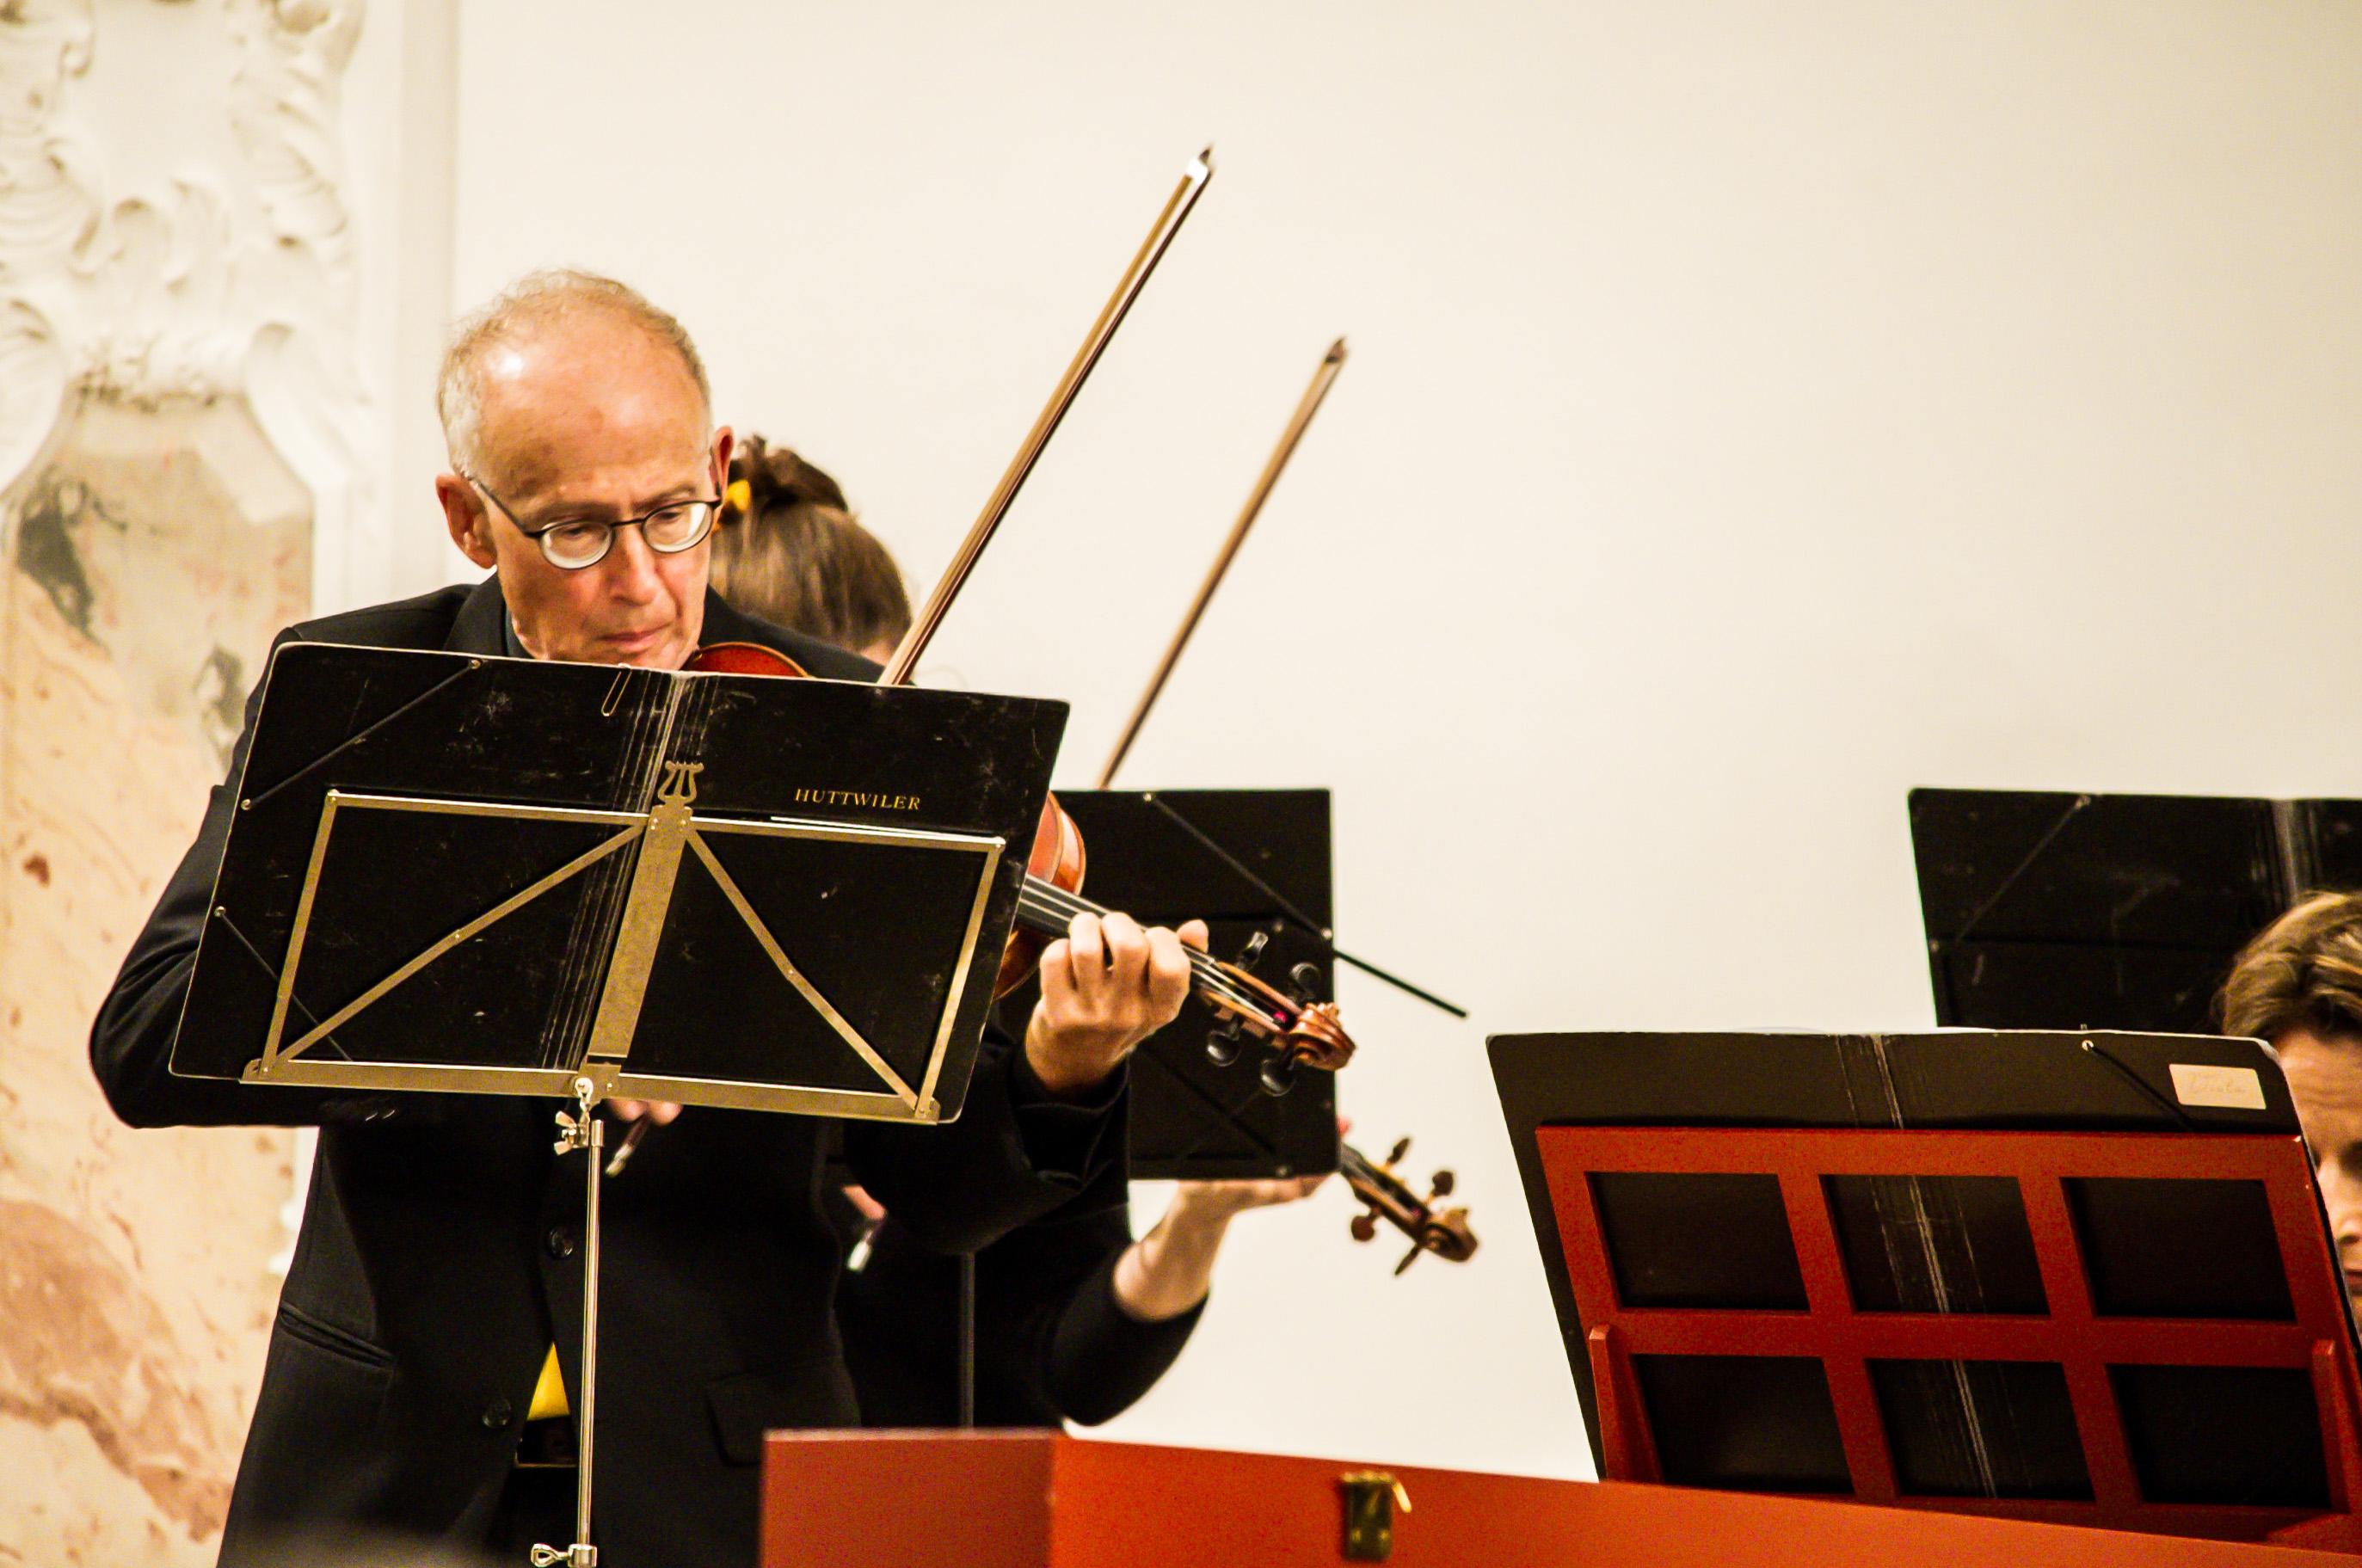 17_09_Herbstkonzert Kammerorchester Huttwil_BO-52